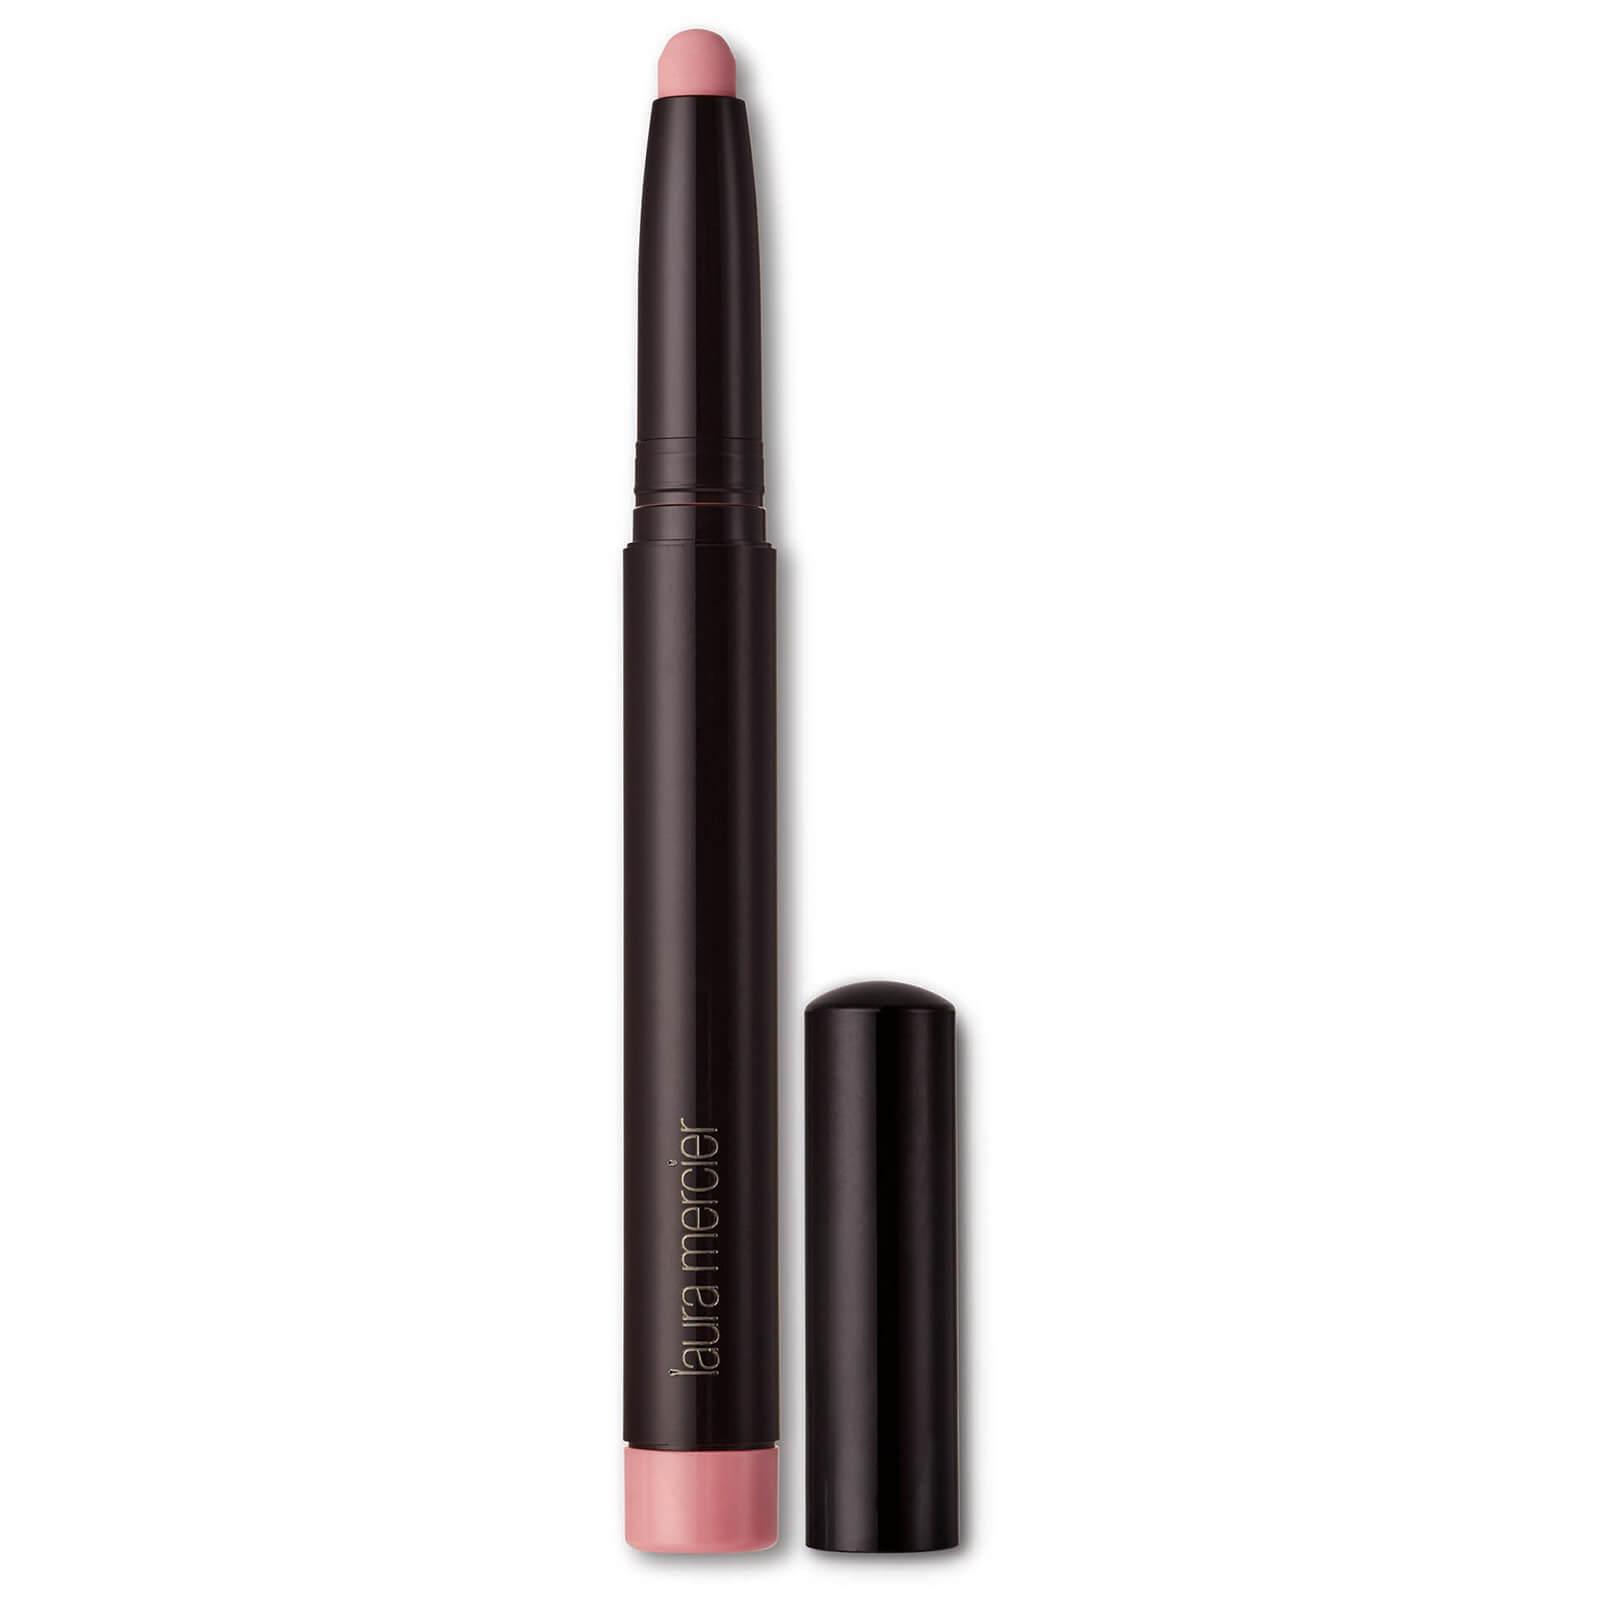 Laura Mercier Velour Extreme Matte Lipstick 1.4g (Various Shades) - Ruthless